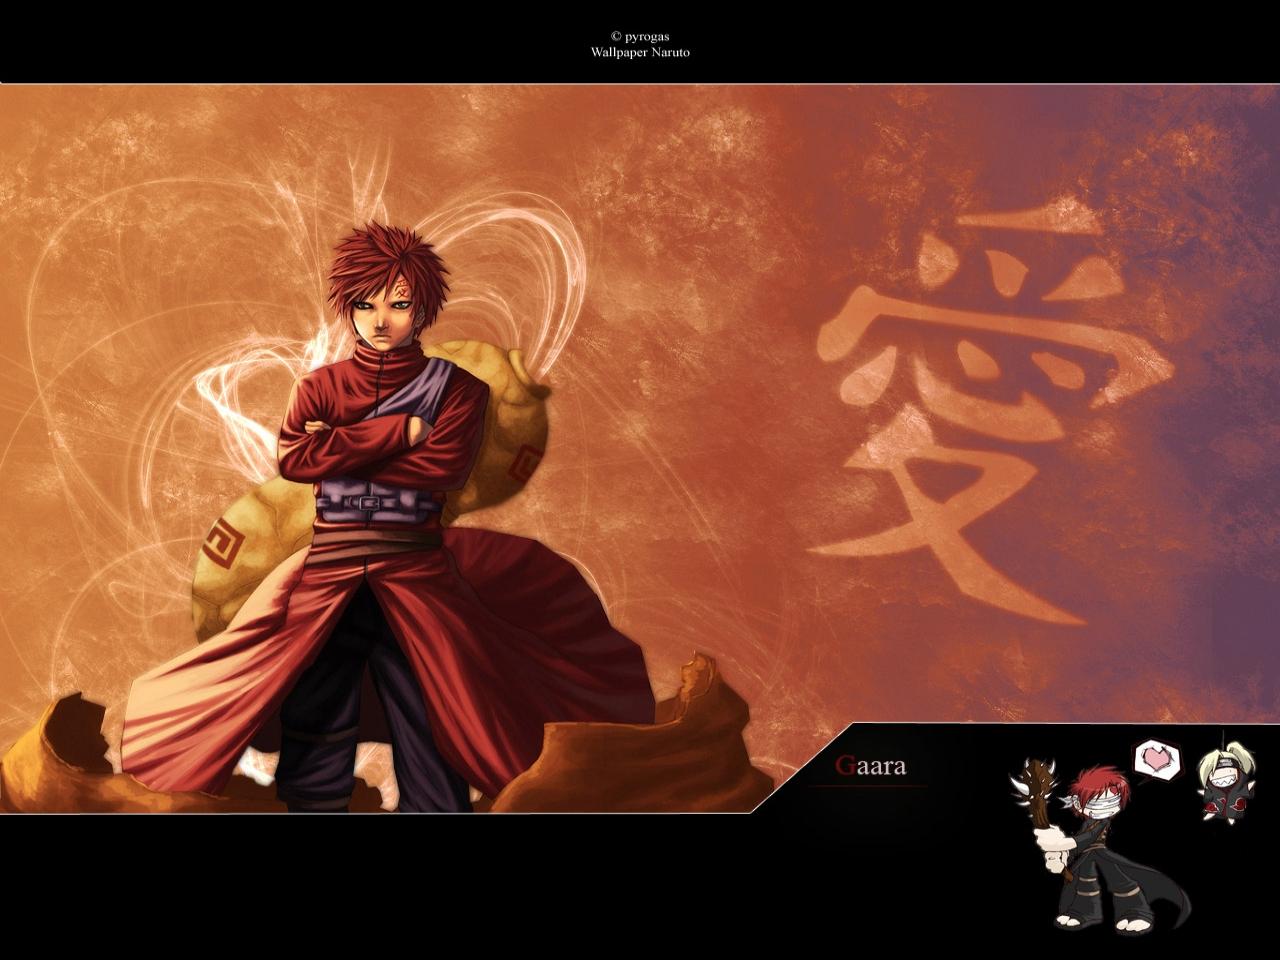 http://1.bp.blogspot.com/-H-BgxewJTG4/TlSJUMPepwI/AAAAAAAAEU0/B_Vwb9AQoOs/s1600/free_naruto_game_wallpaper.jpg